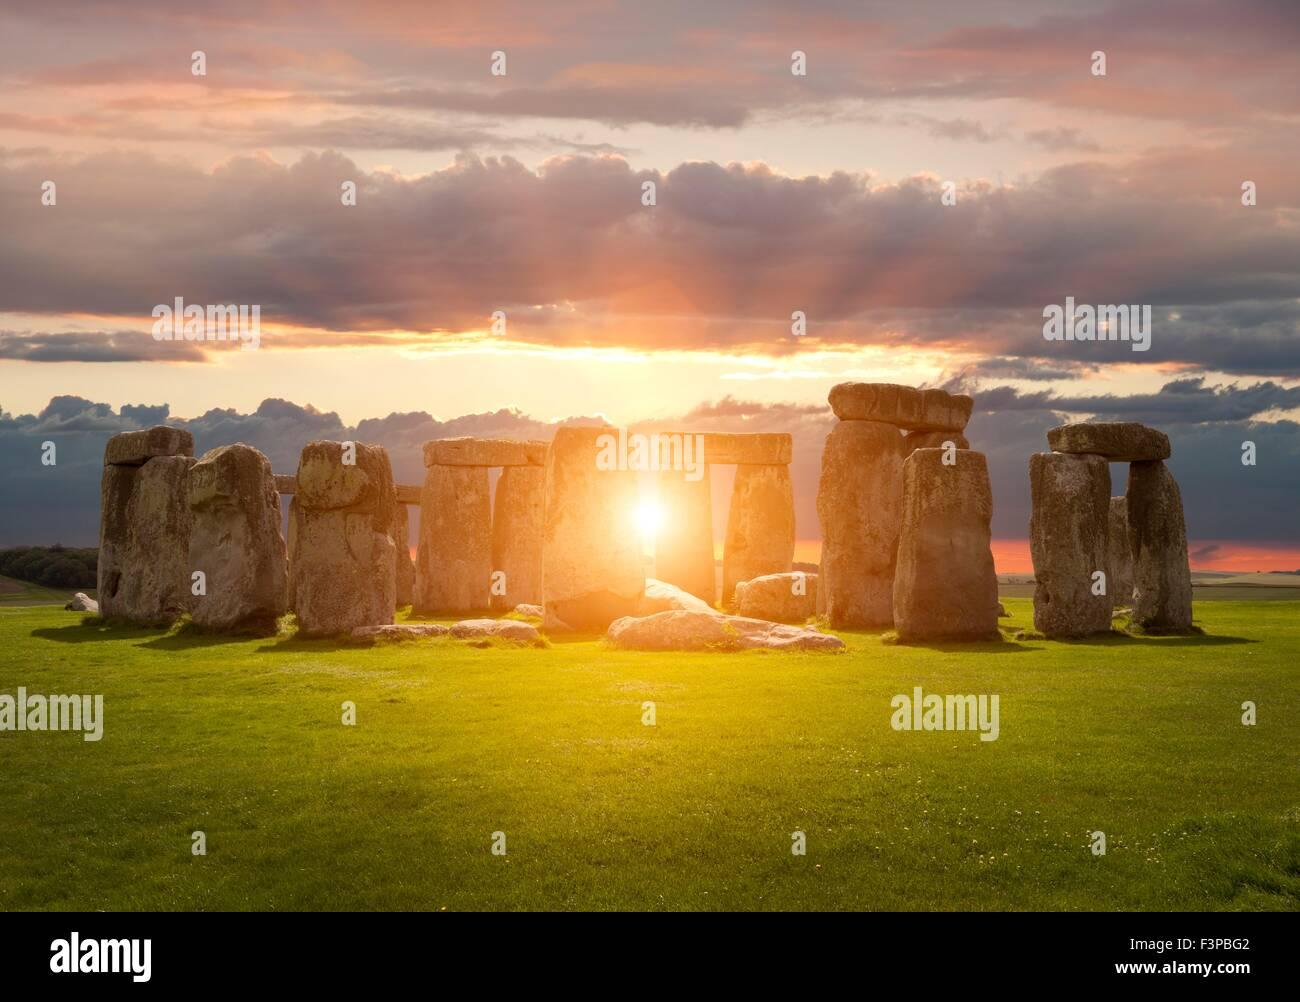 The sun setting over Stonehenge, Wiltshire, England. Stock Photo